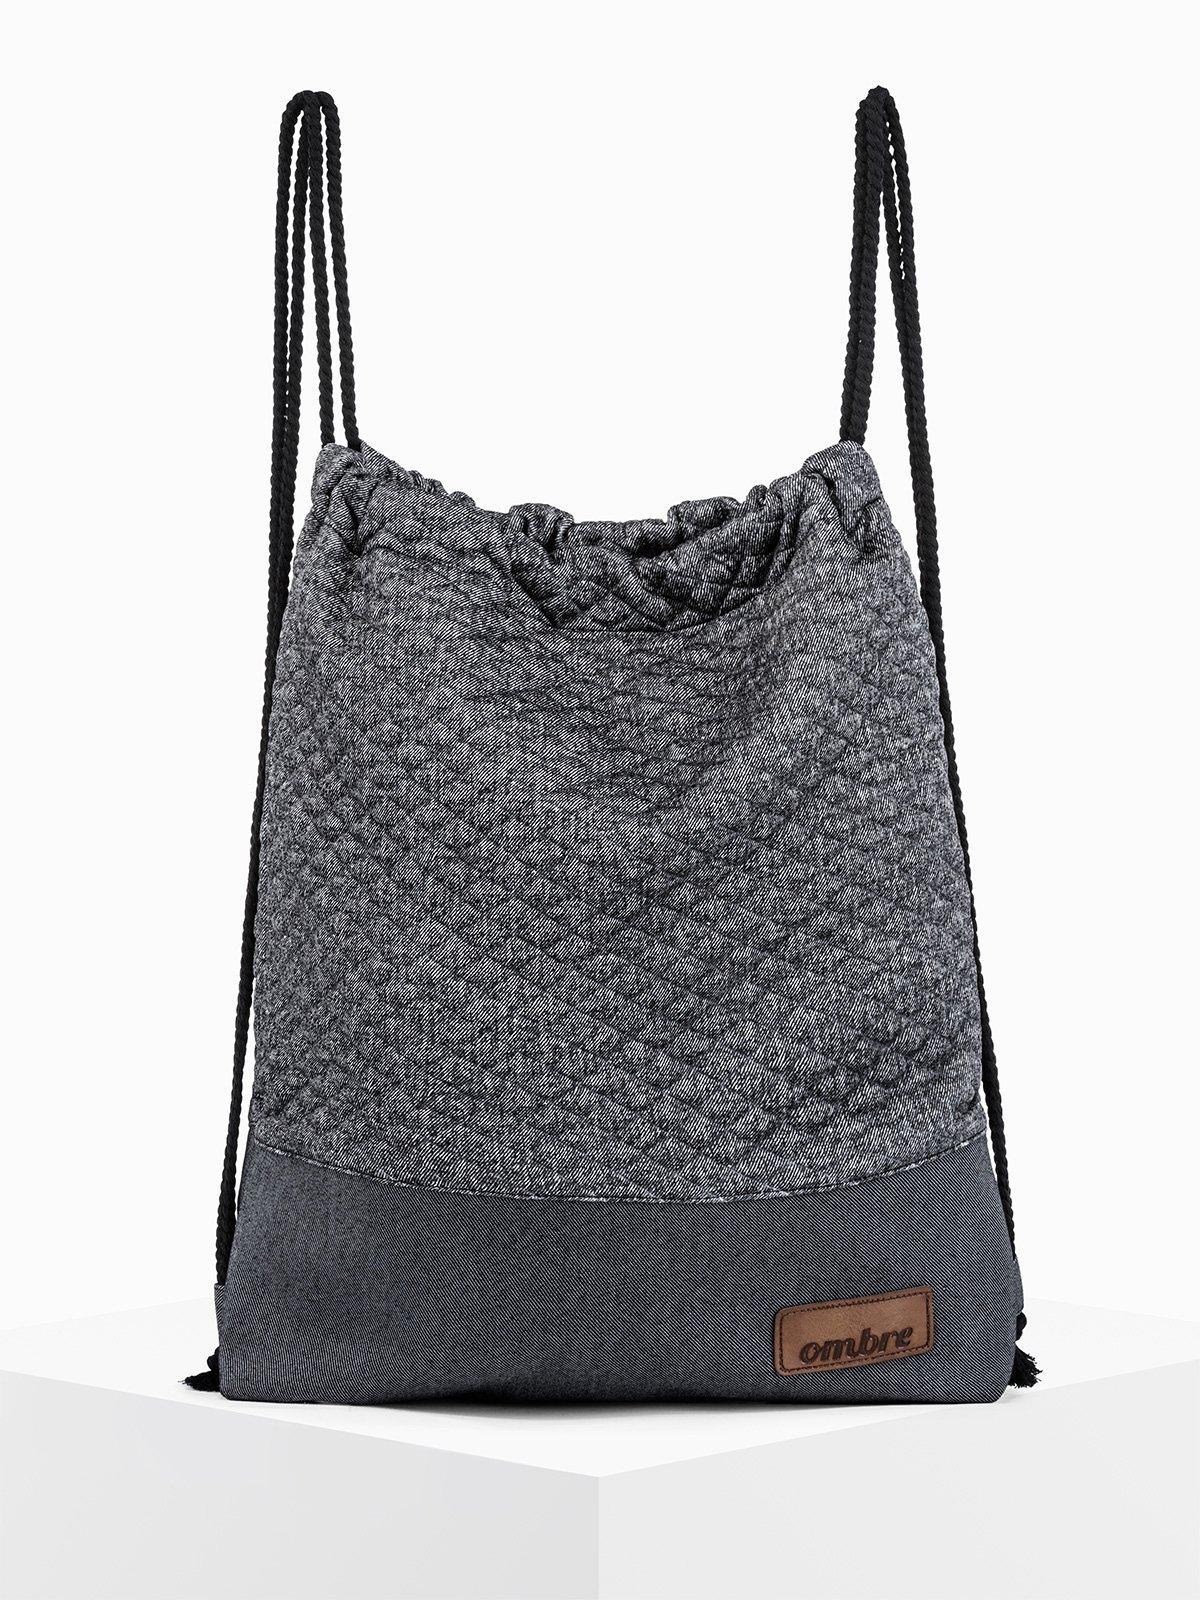 Купить со скидкой Чоловіча сумка-рюкзак A250 - сіра